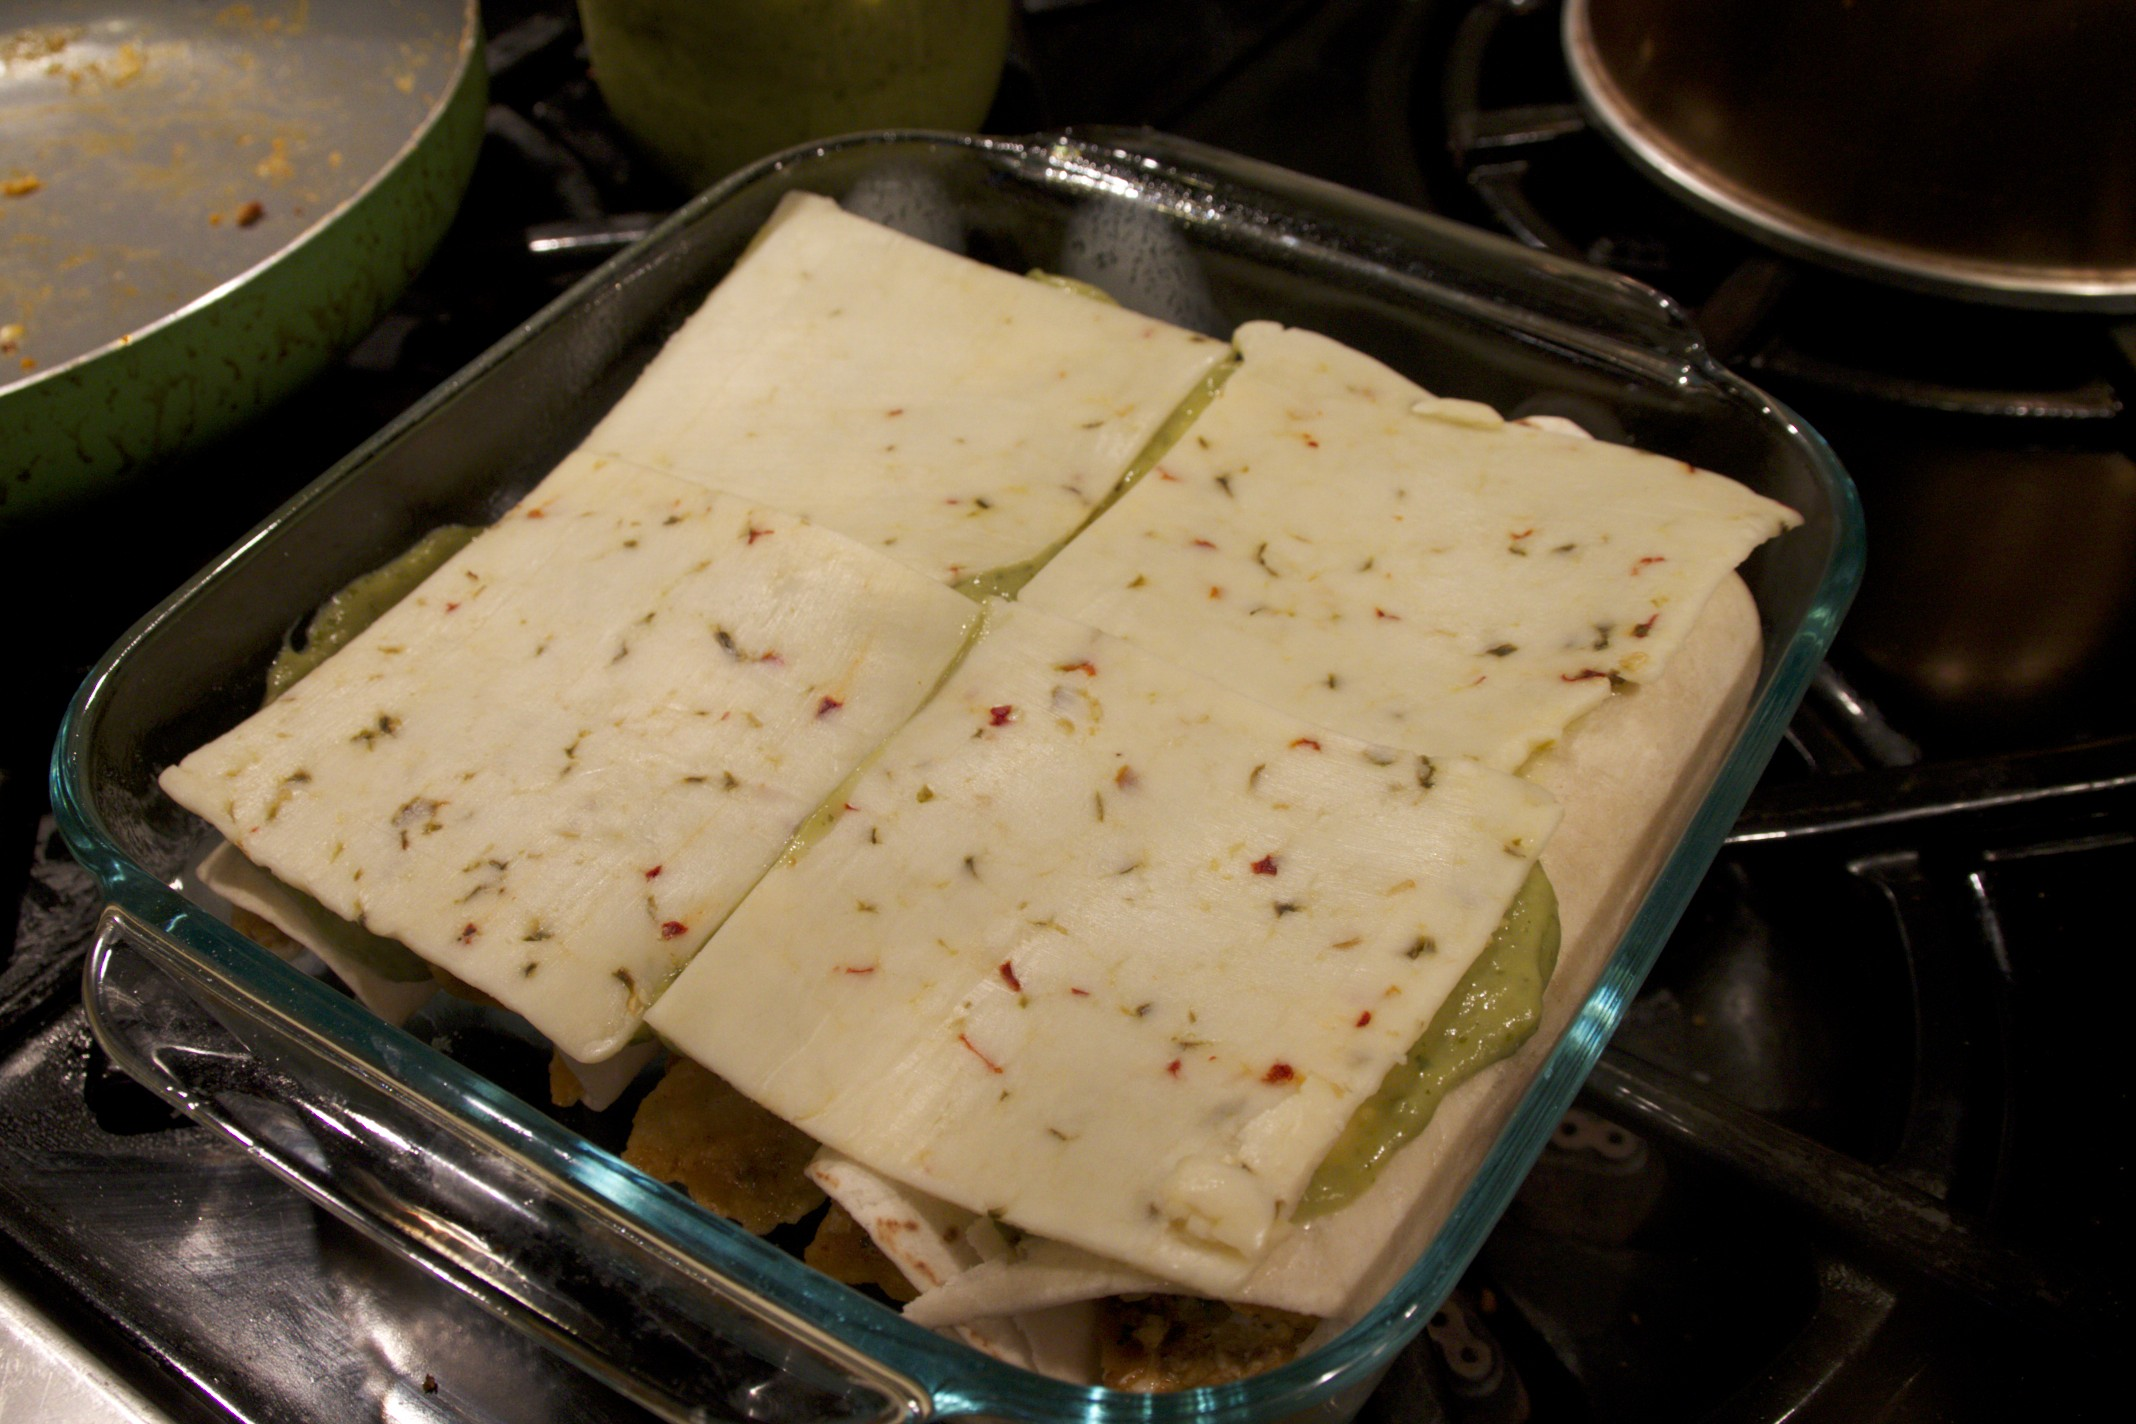 migas breakfast enchiladas